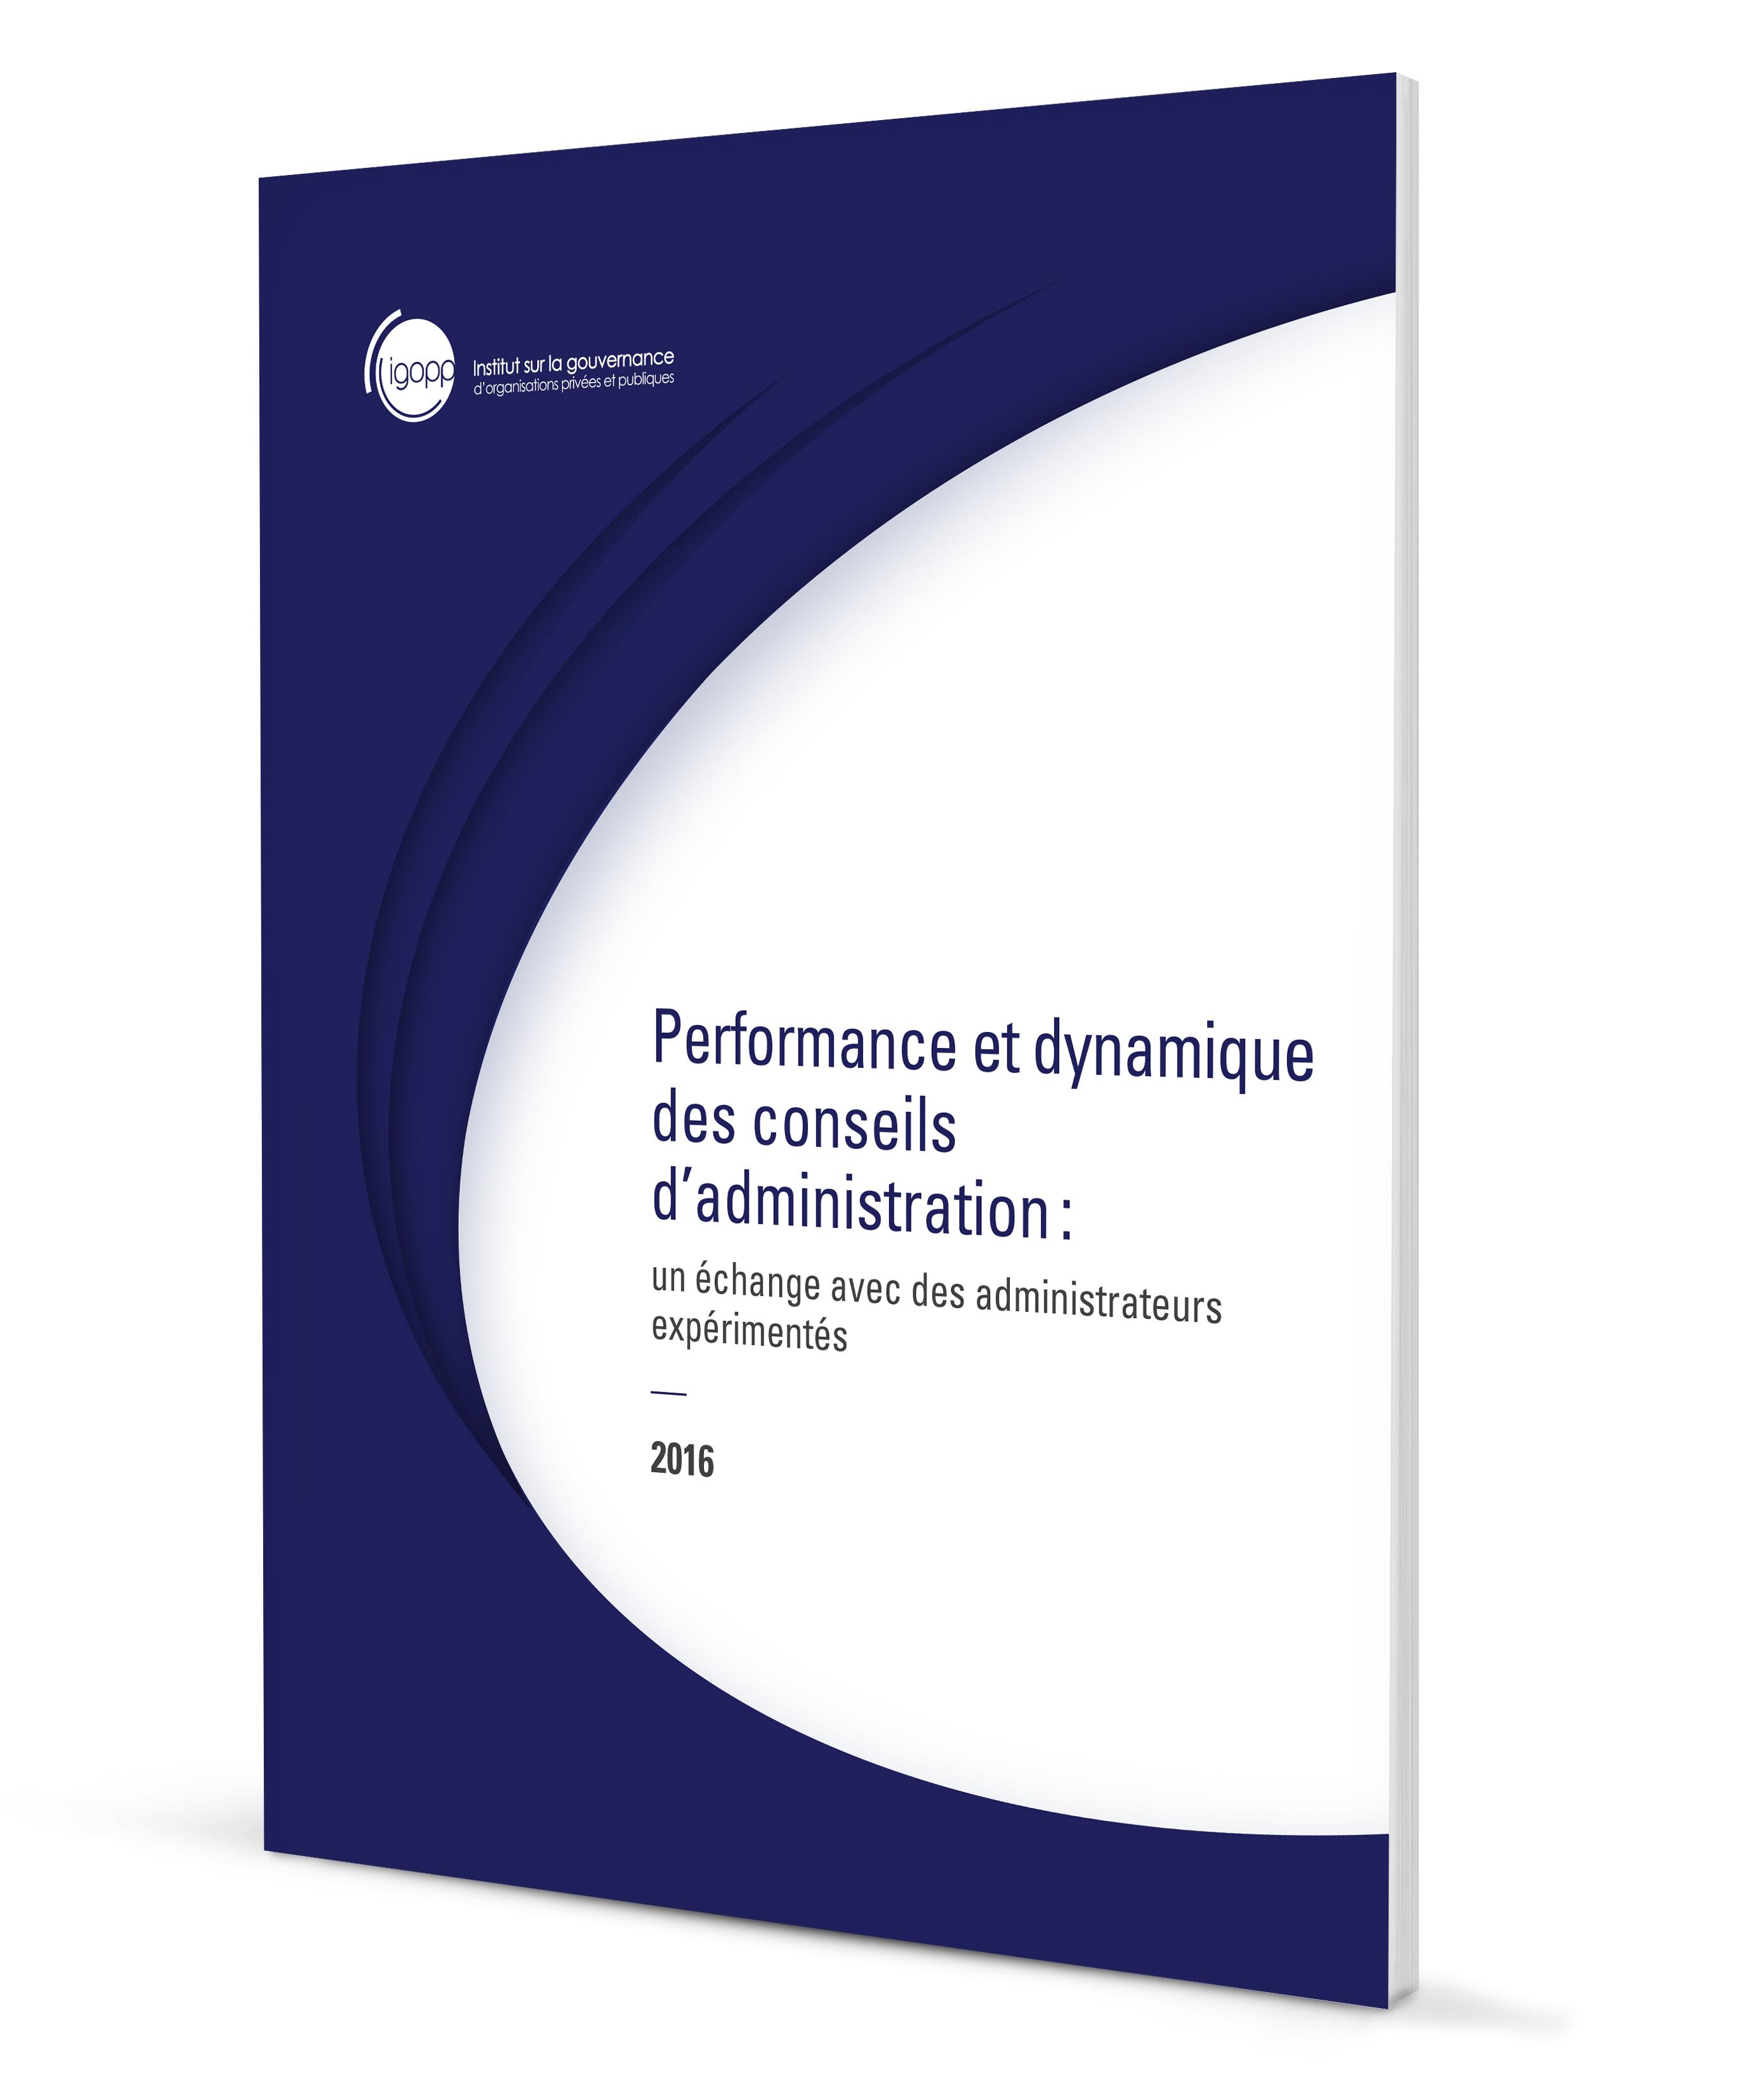 IGOPP_WEB_Publication_Big_2735x3288_PerformanceDynamiqueConseilsAdmin_FR